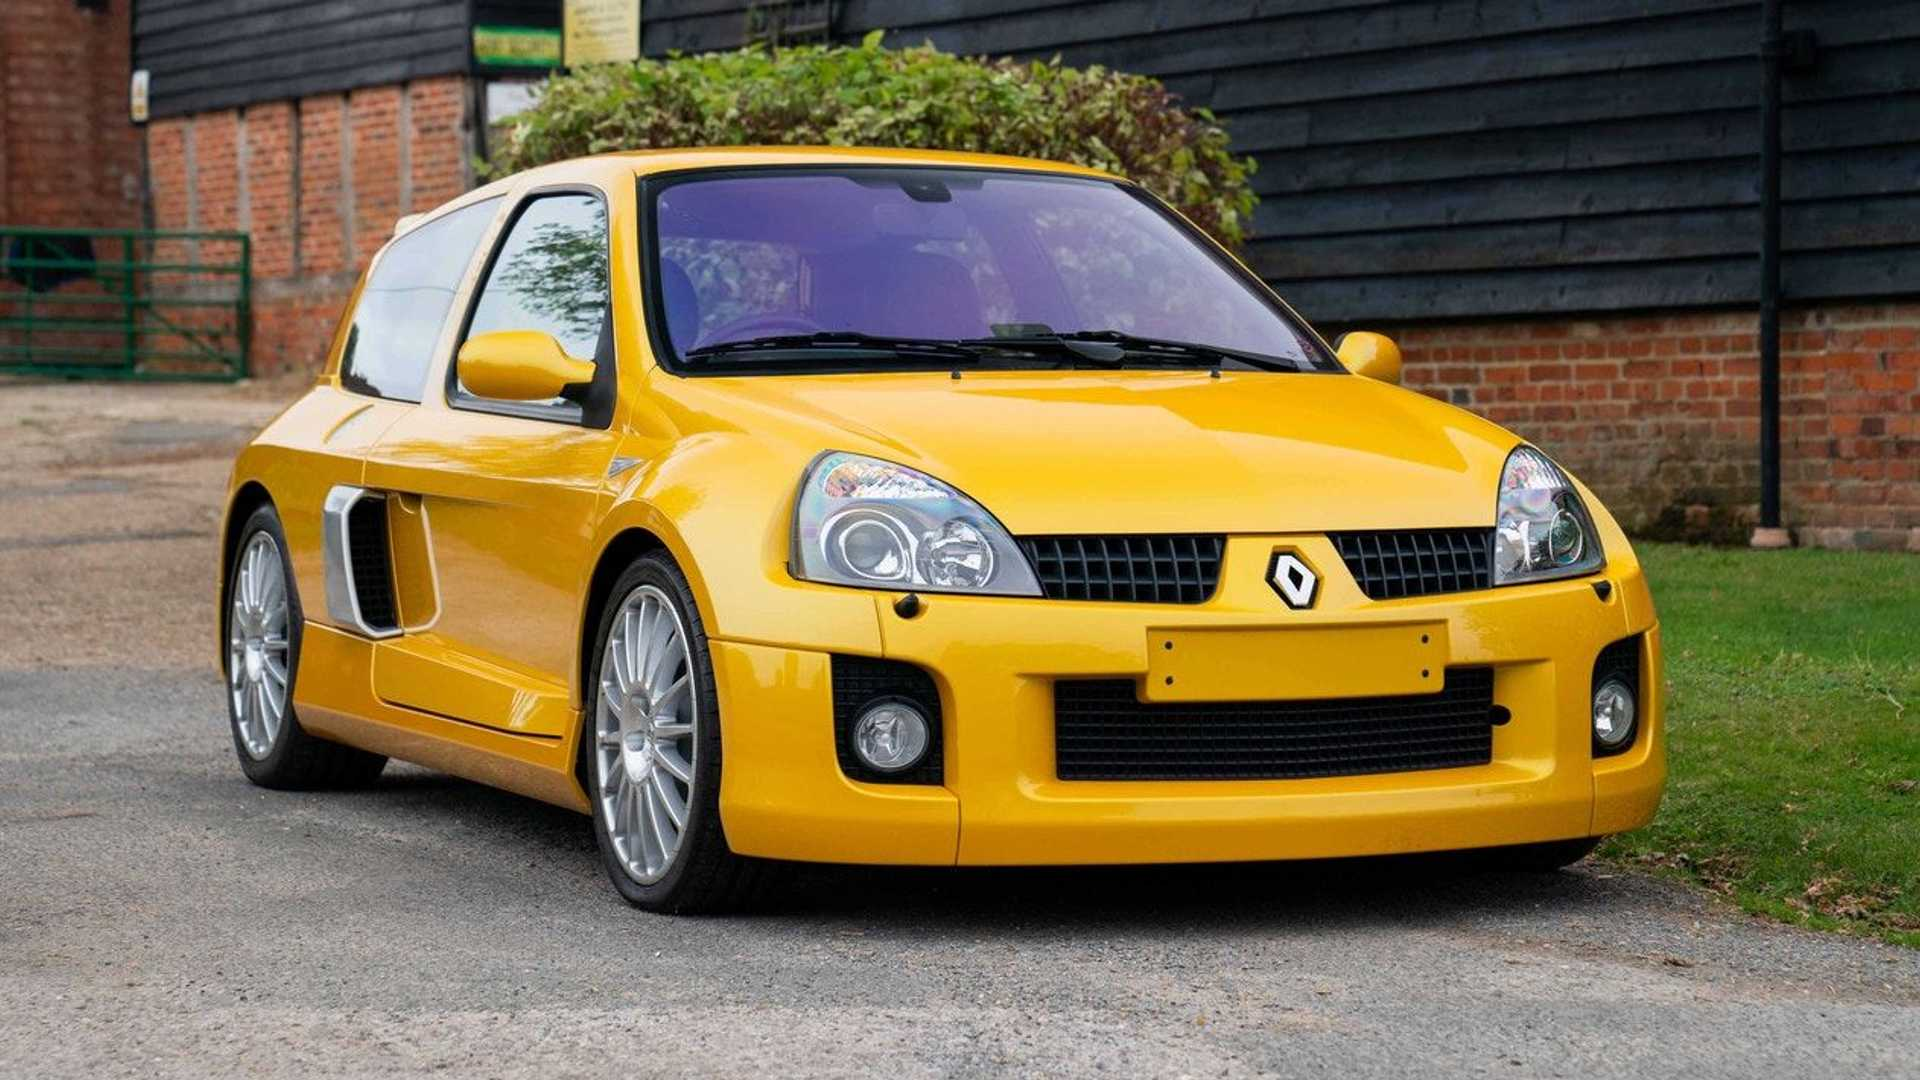 A subasta un Renault Clio V6 de 2005, con menos de 1.600 km